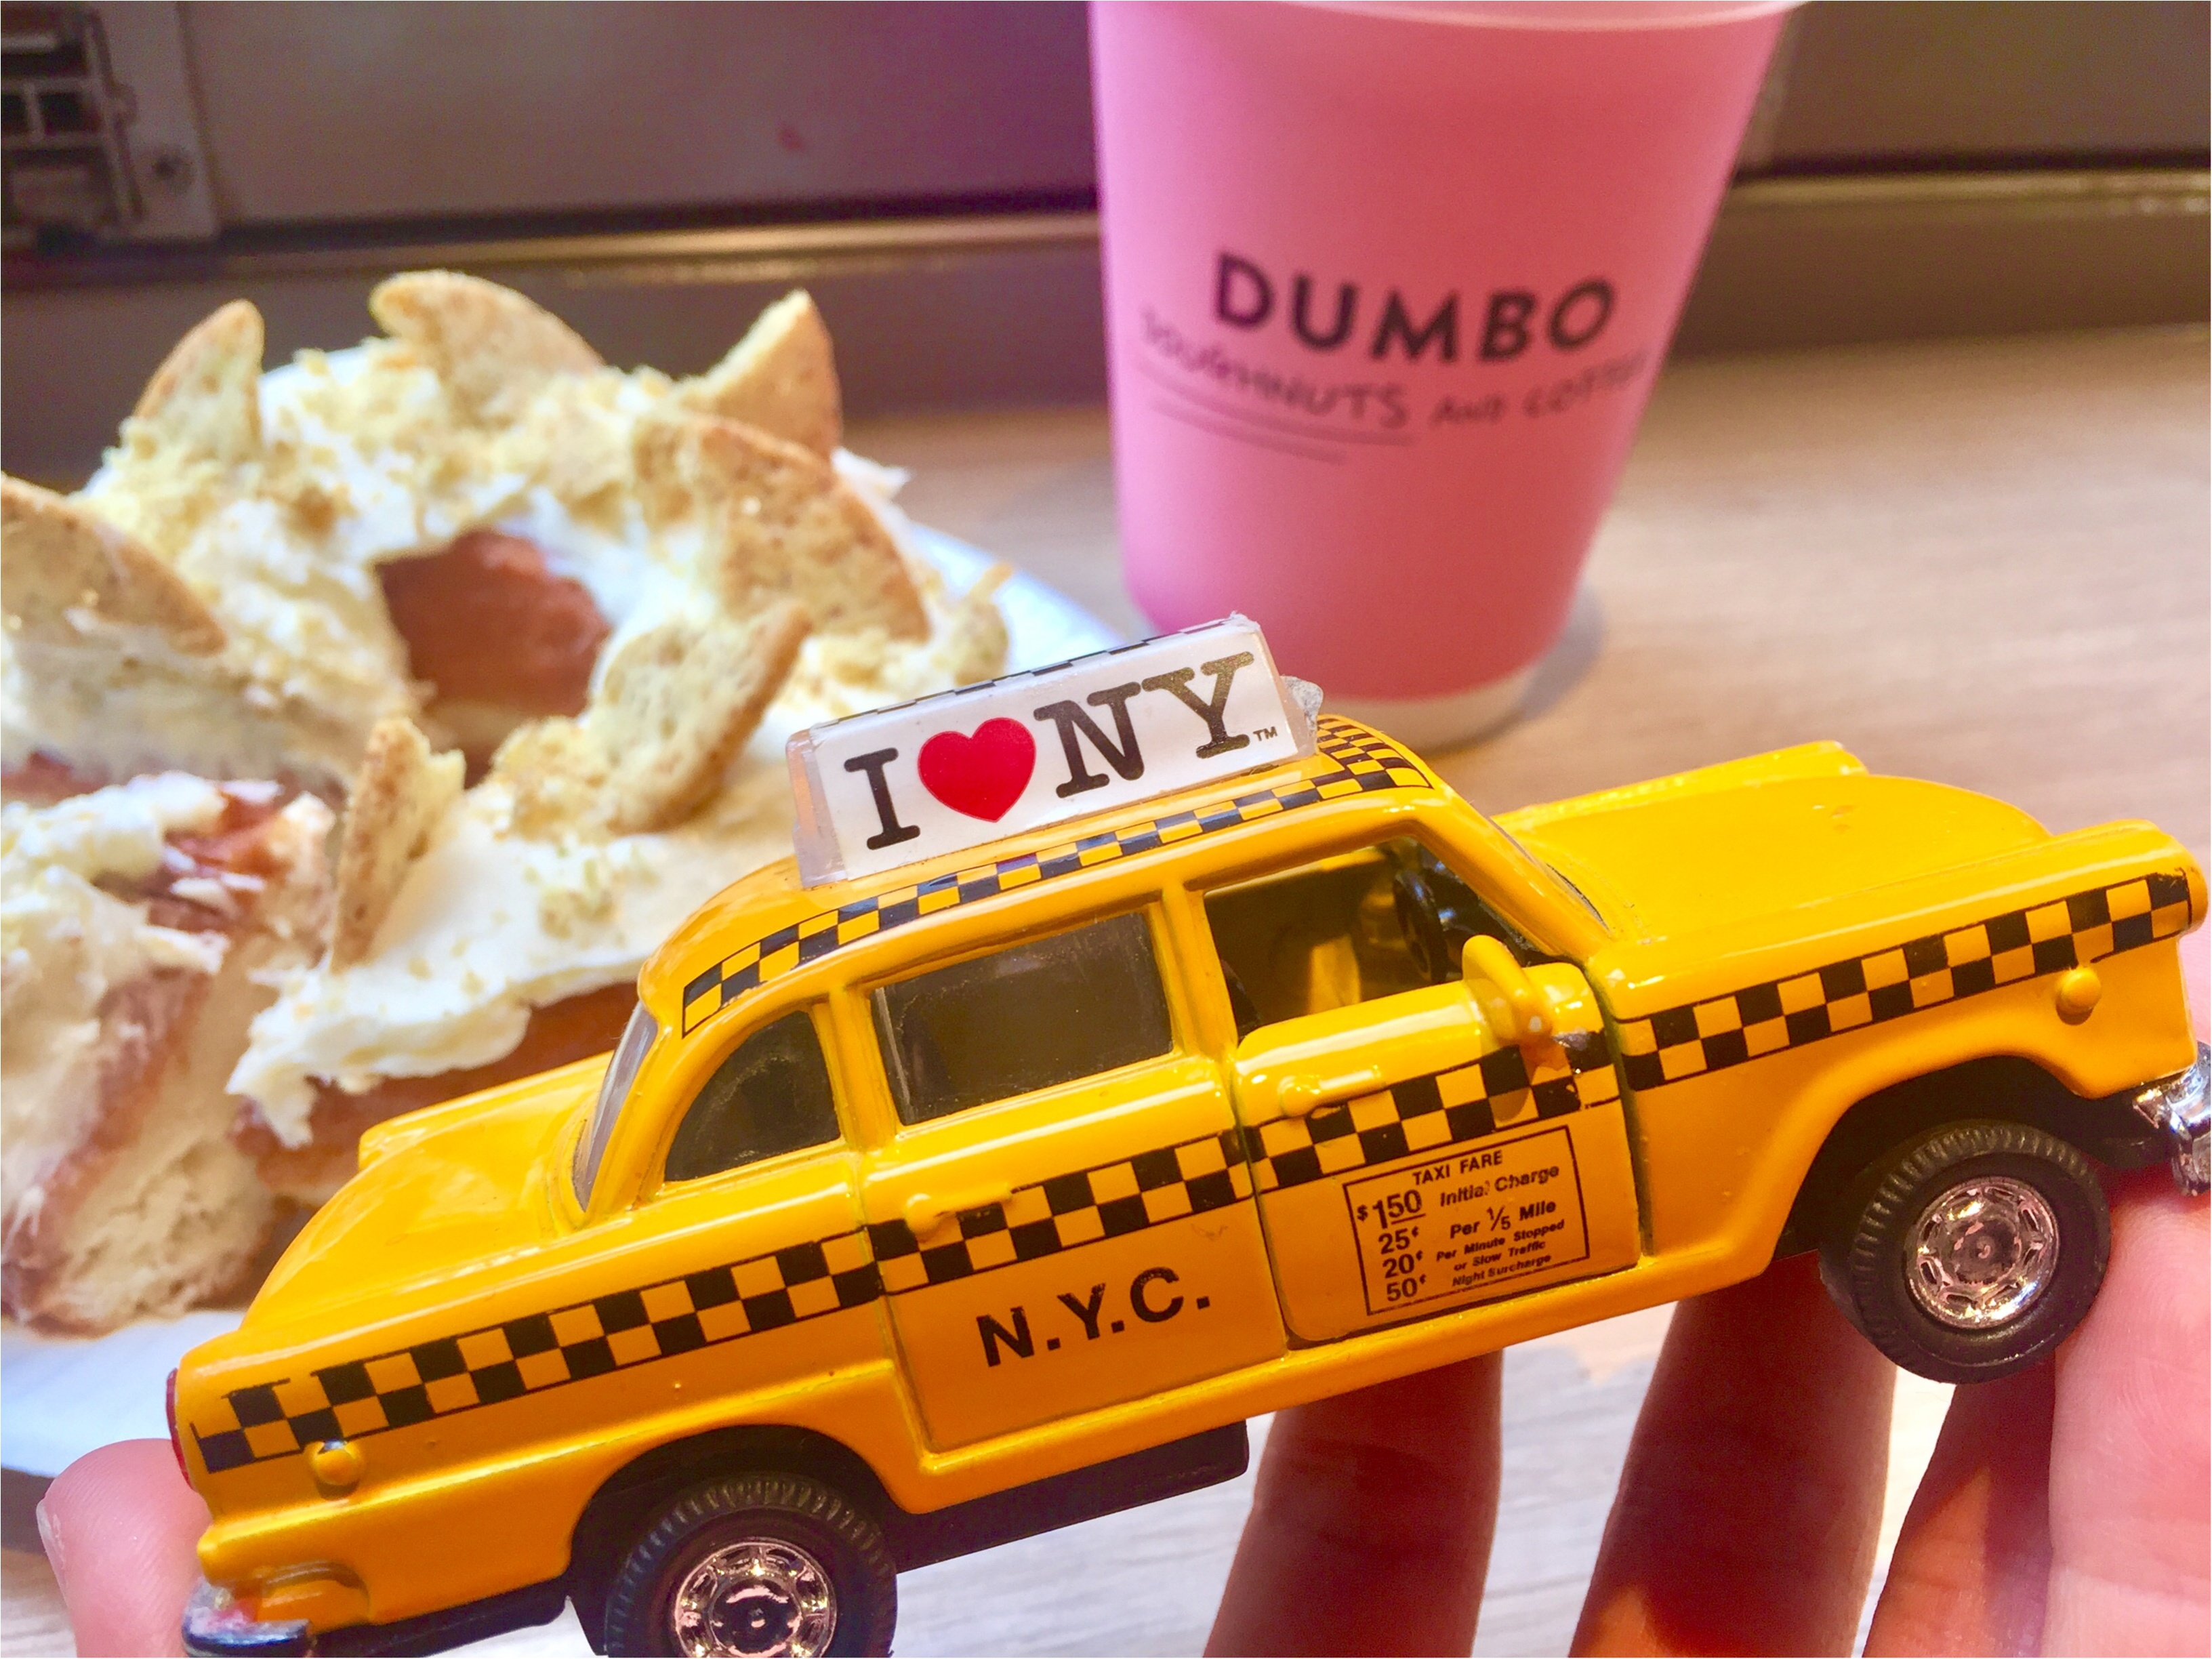 【FOOD】人気の理由を徹底解剖!おしゃれな人はみーんな行ってる♡DUMBO Doughnuts and Coffee♡_4